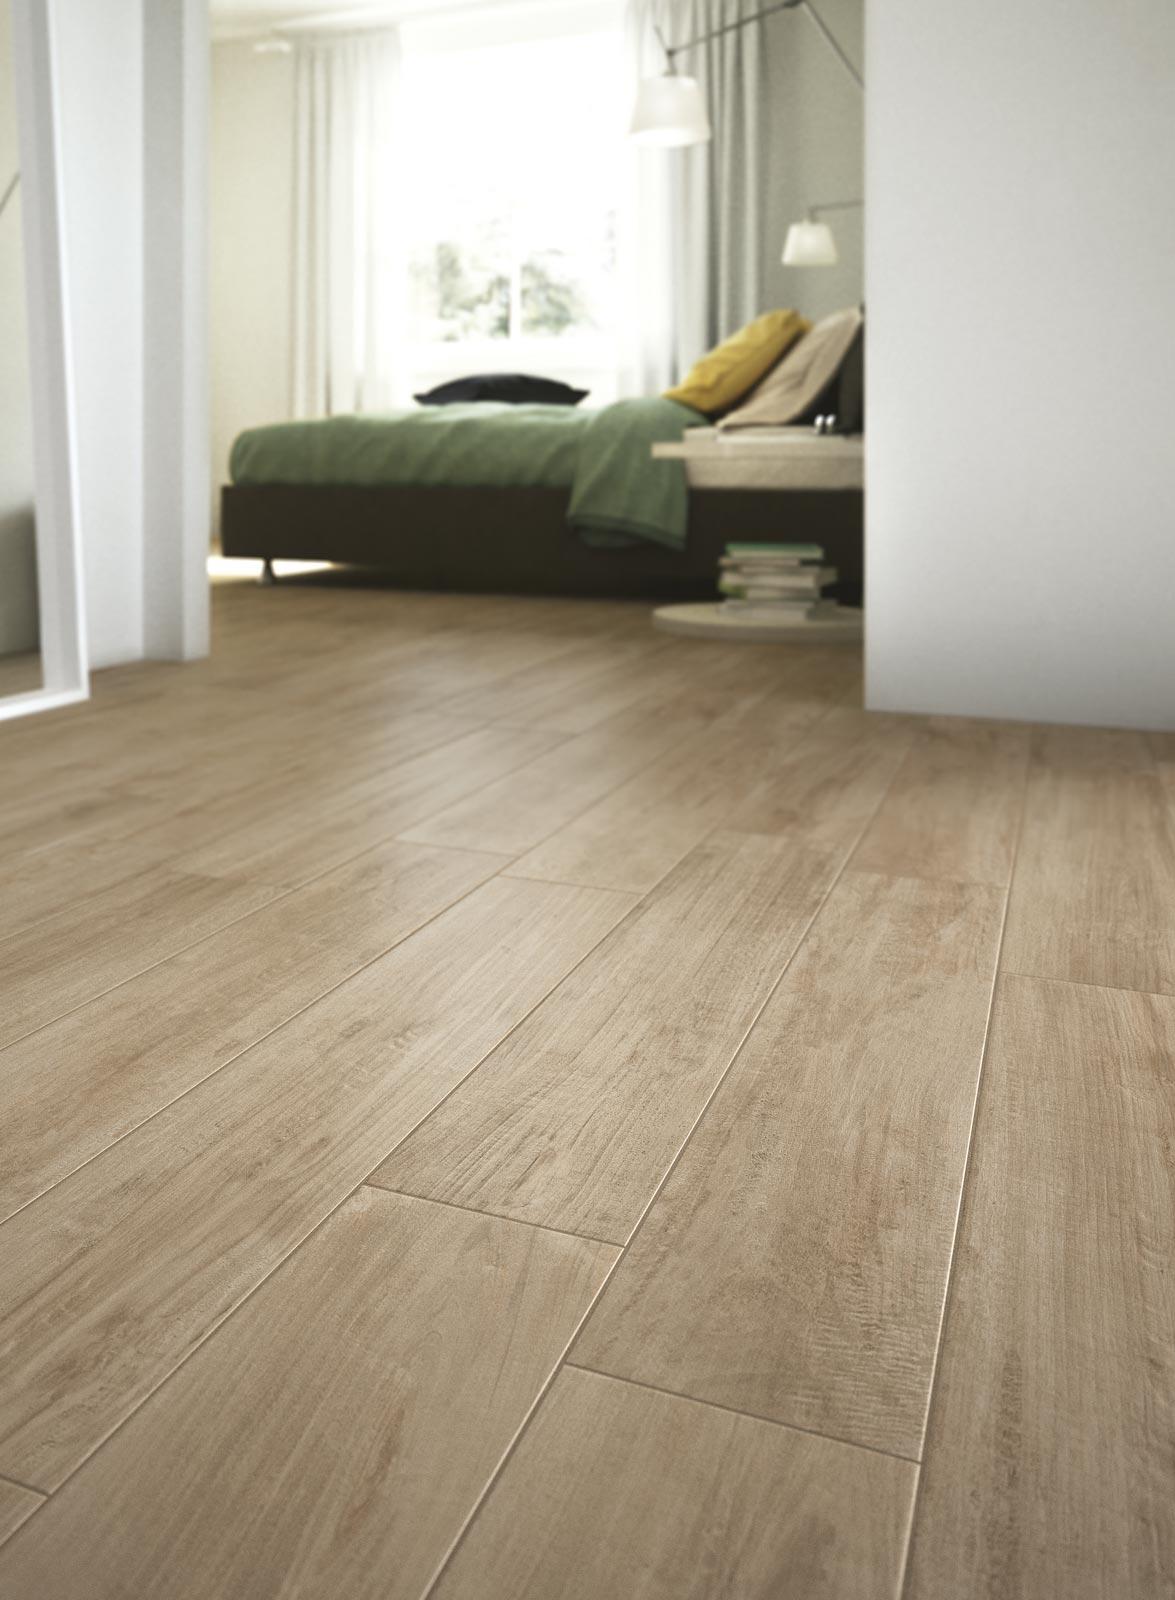 Woodcomfort Collection Wood Look Stoneware Floor Tiles